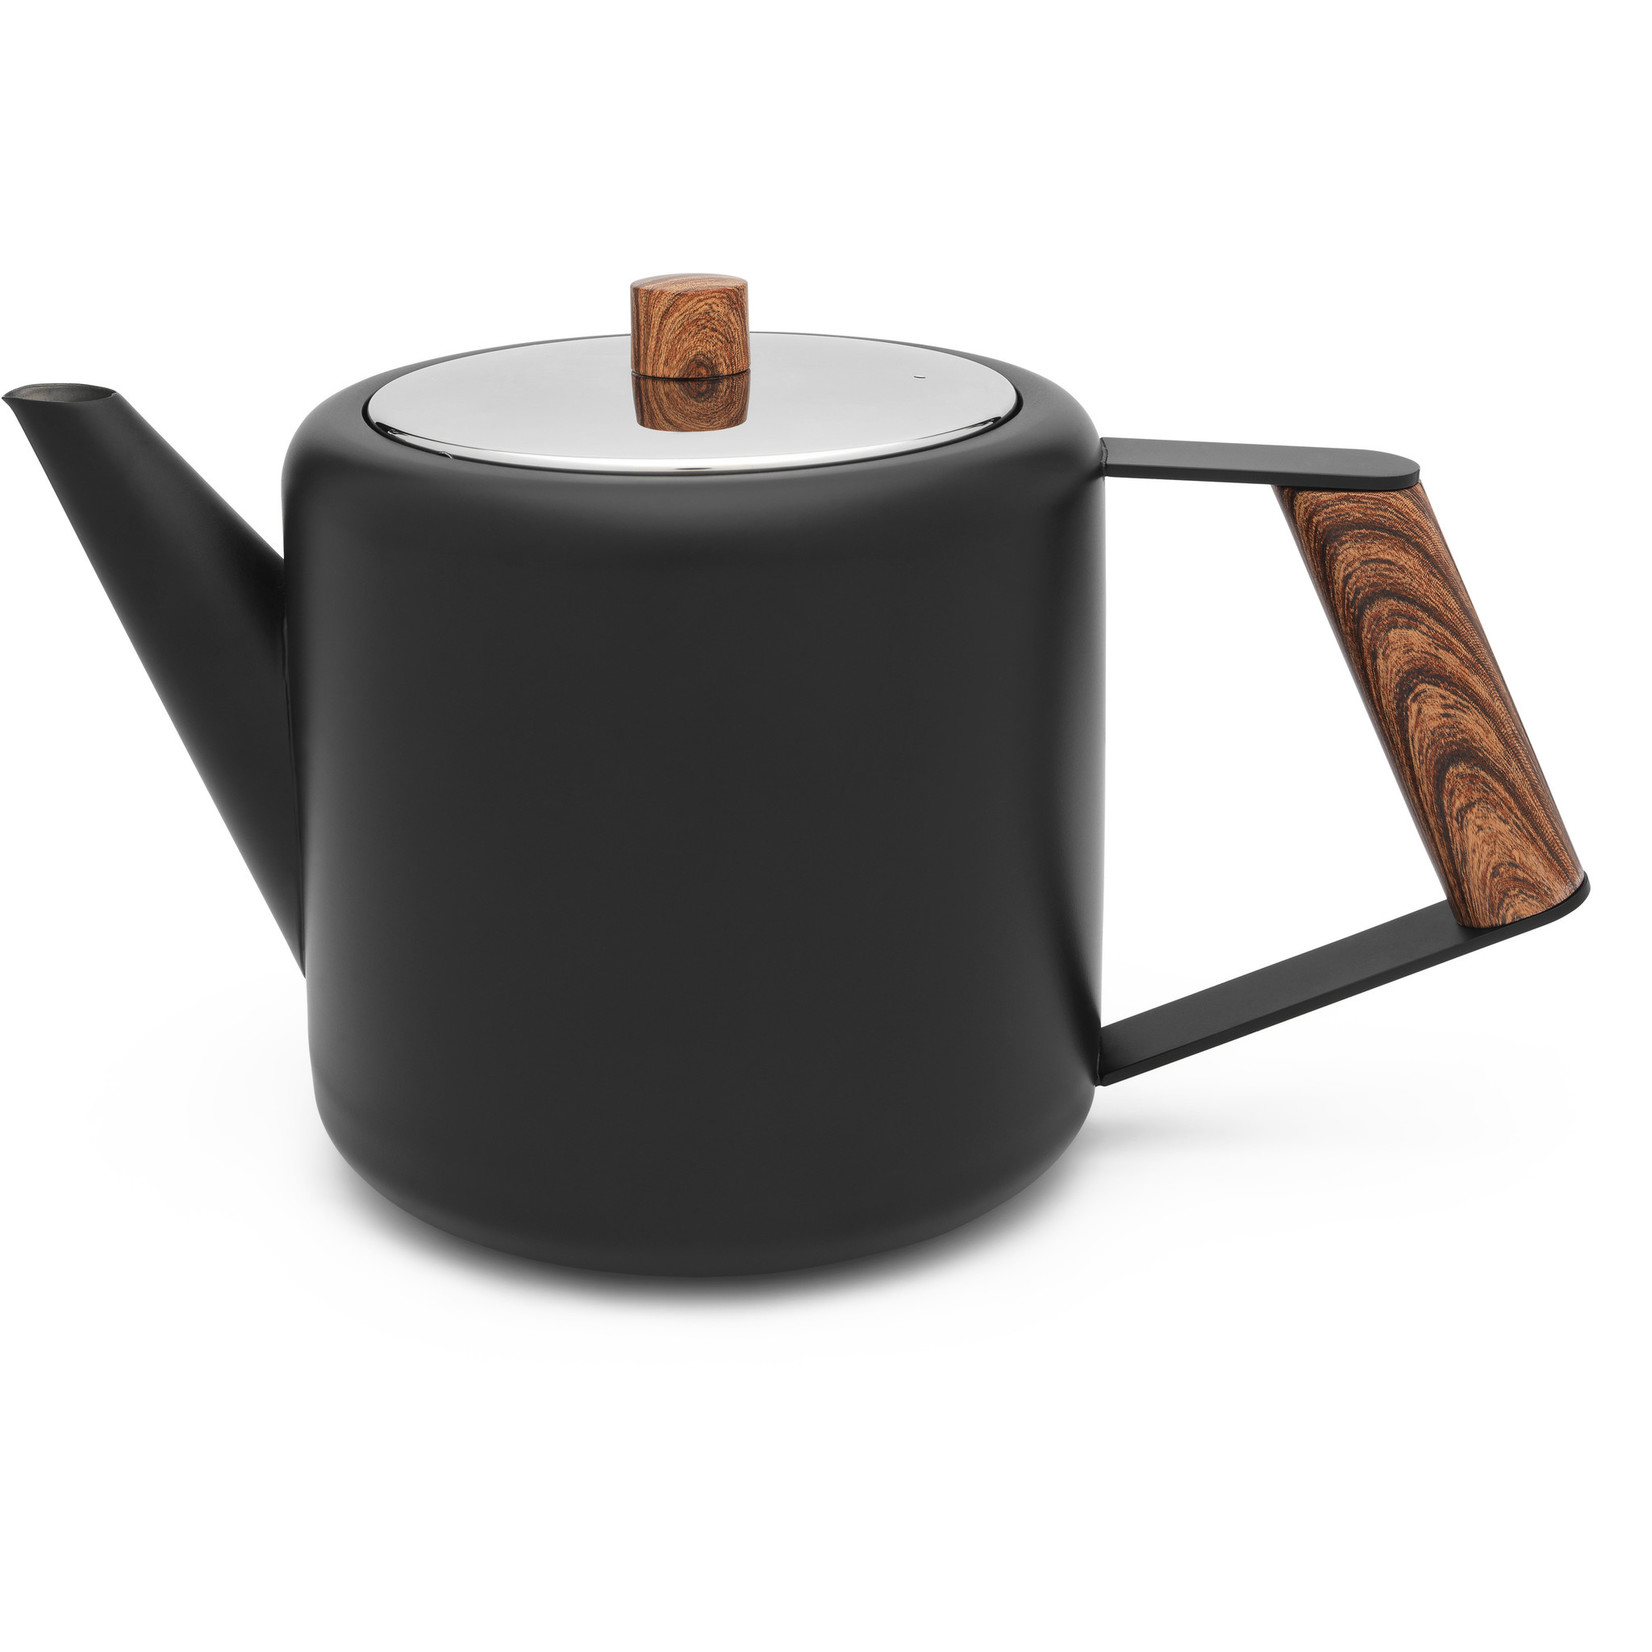 Bredemeijer Bredemeijer Duet Design Theepot Boston, mat zwart, hout 1,1L